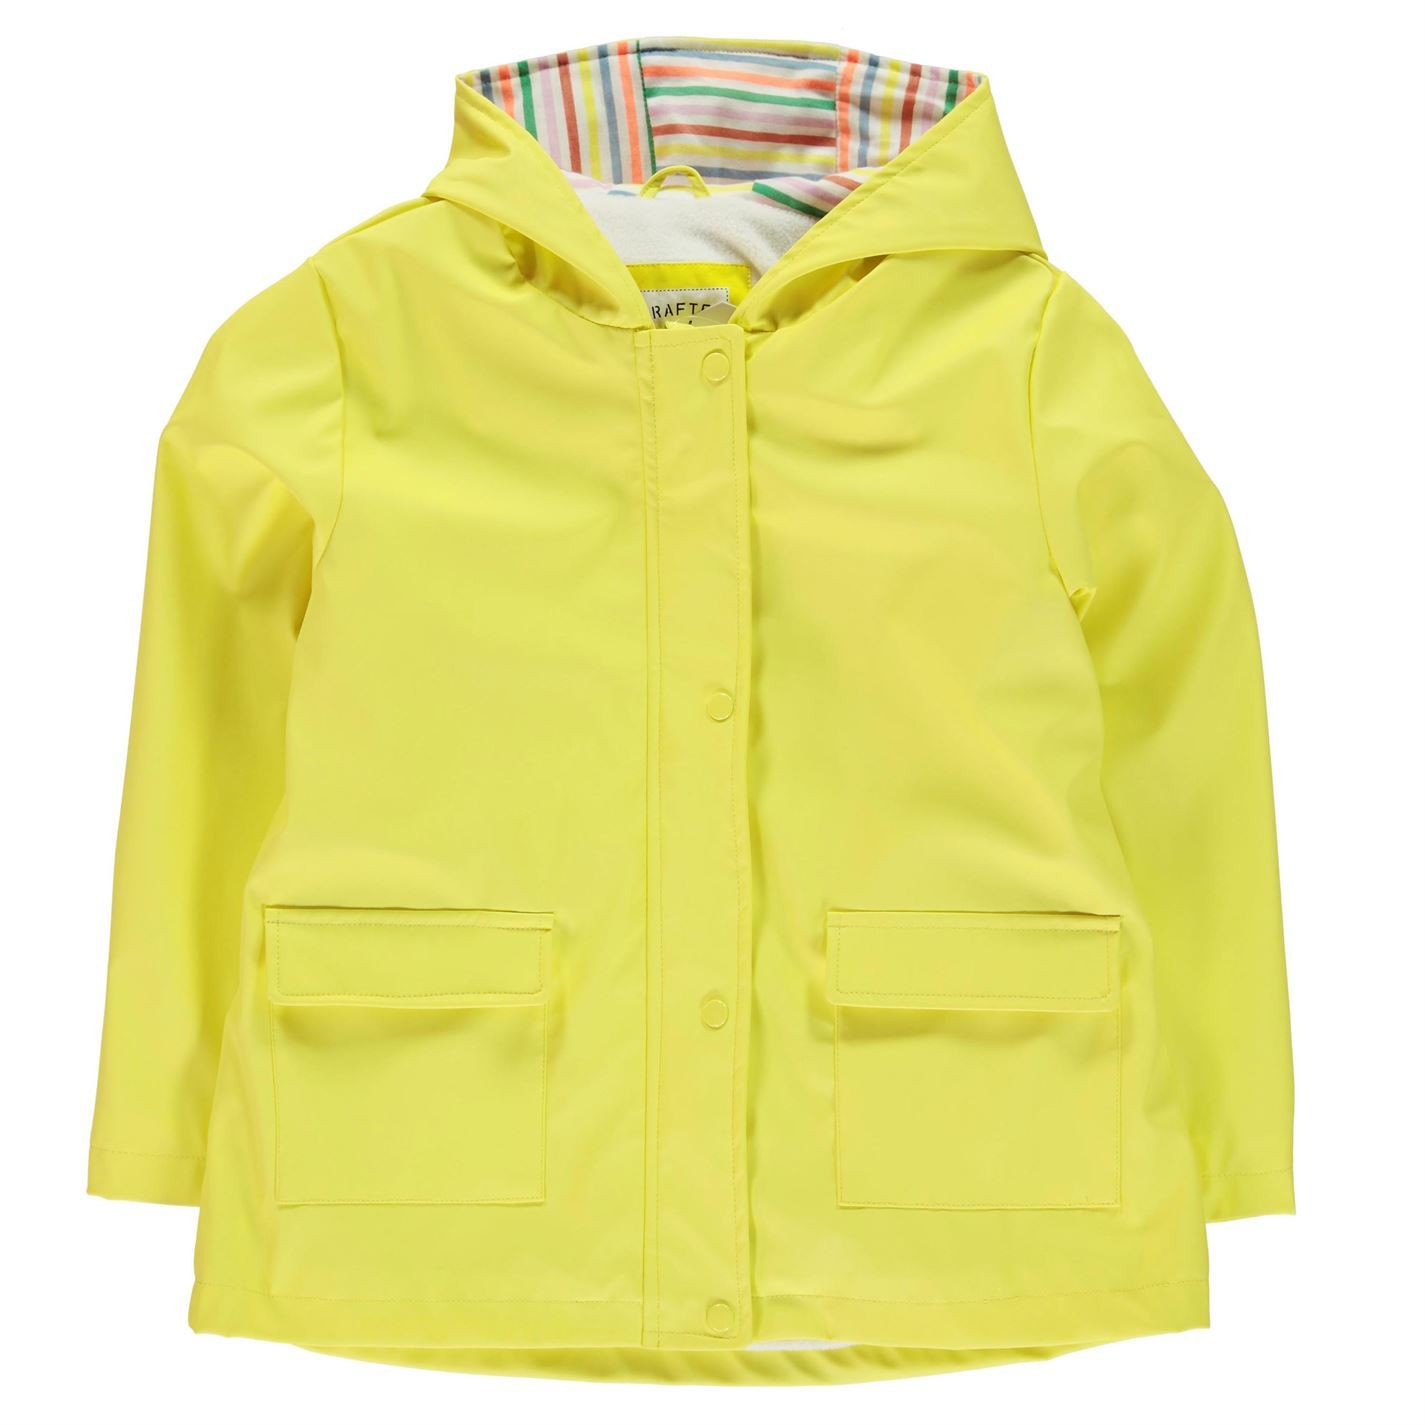 1b5dfd1d3 Crafted Kids Girls Hooded Mac Child Rain Jacket Coat Top Long Sleeve ...